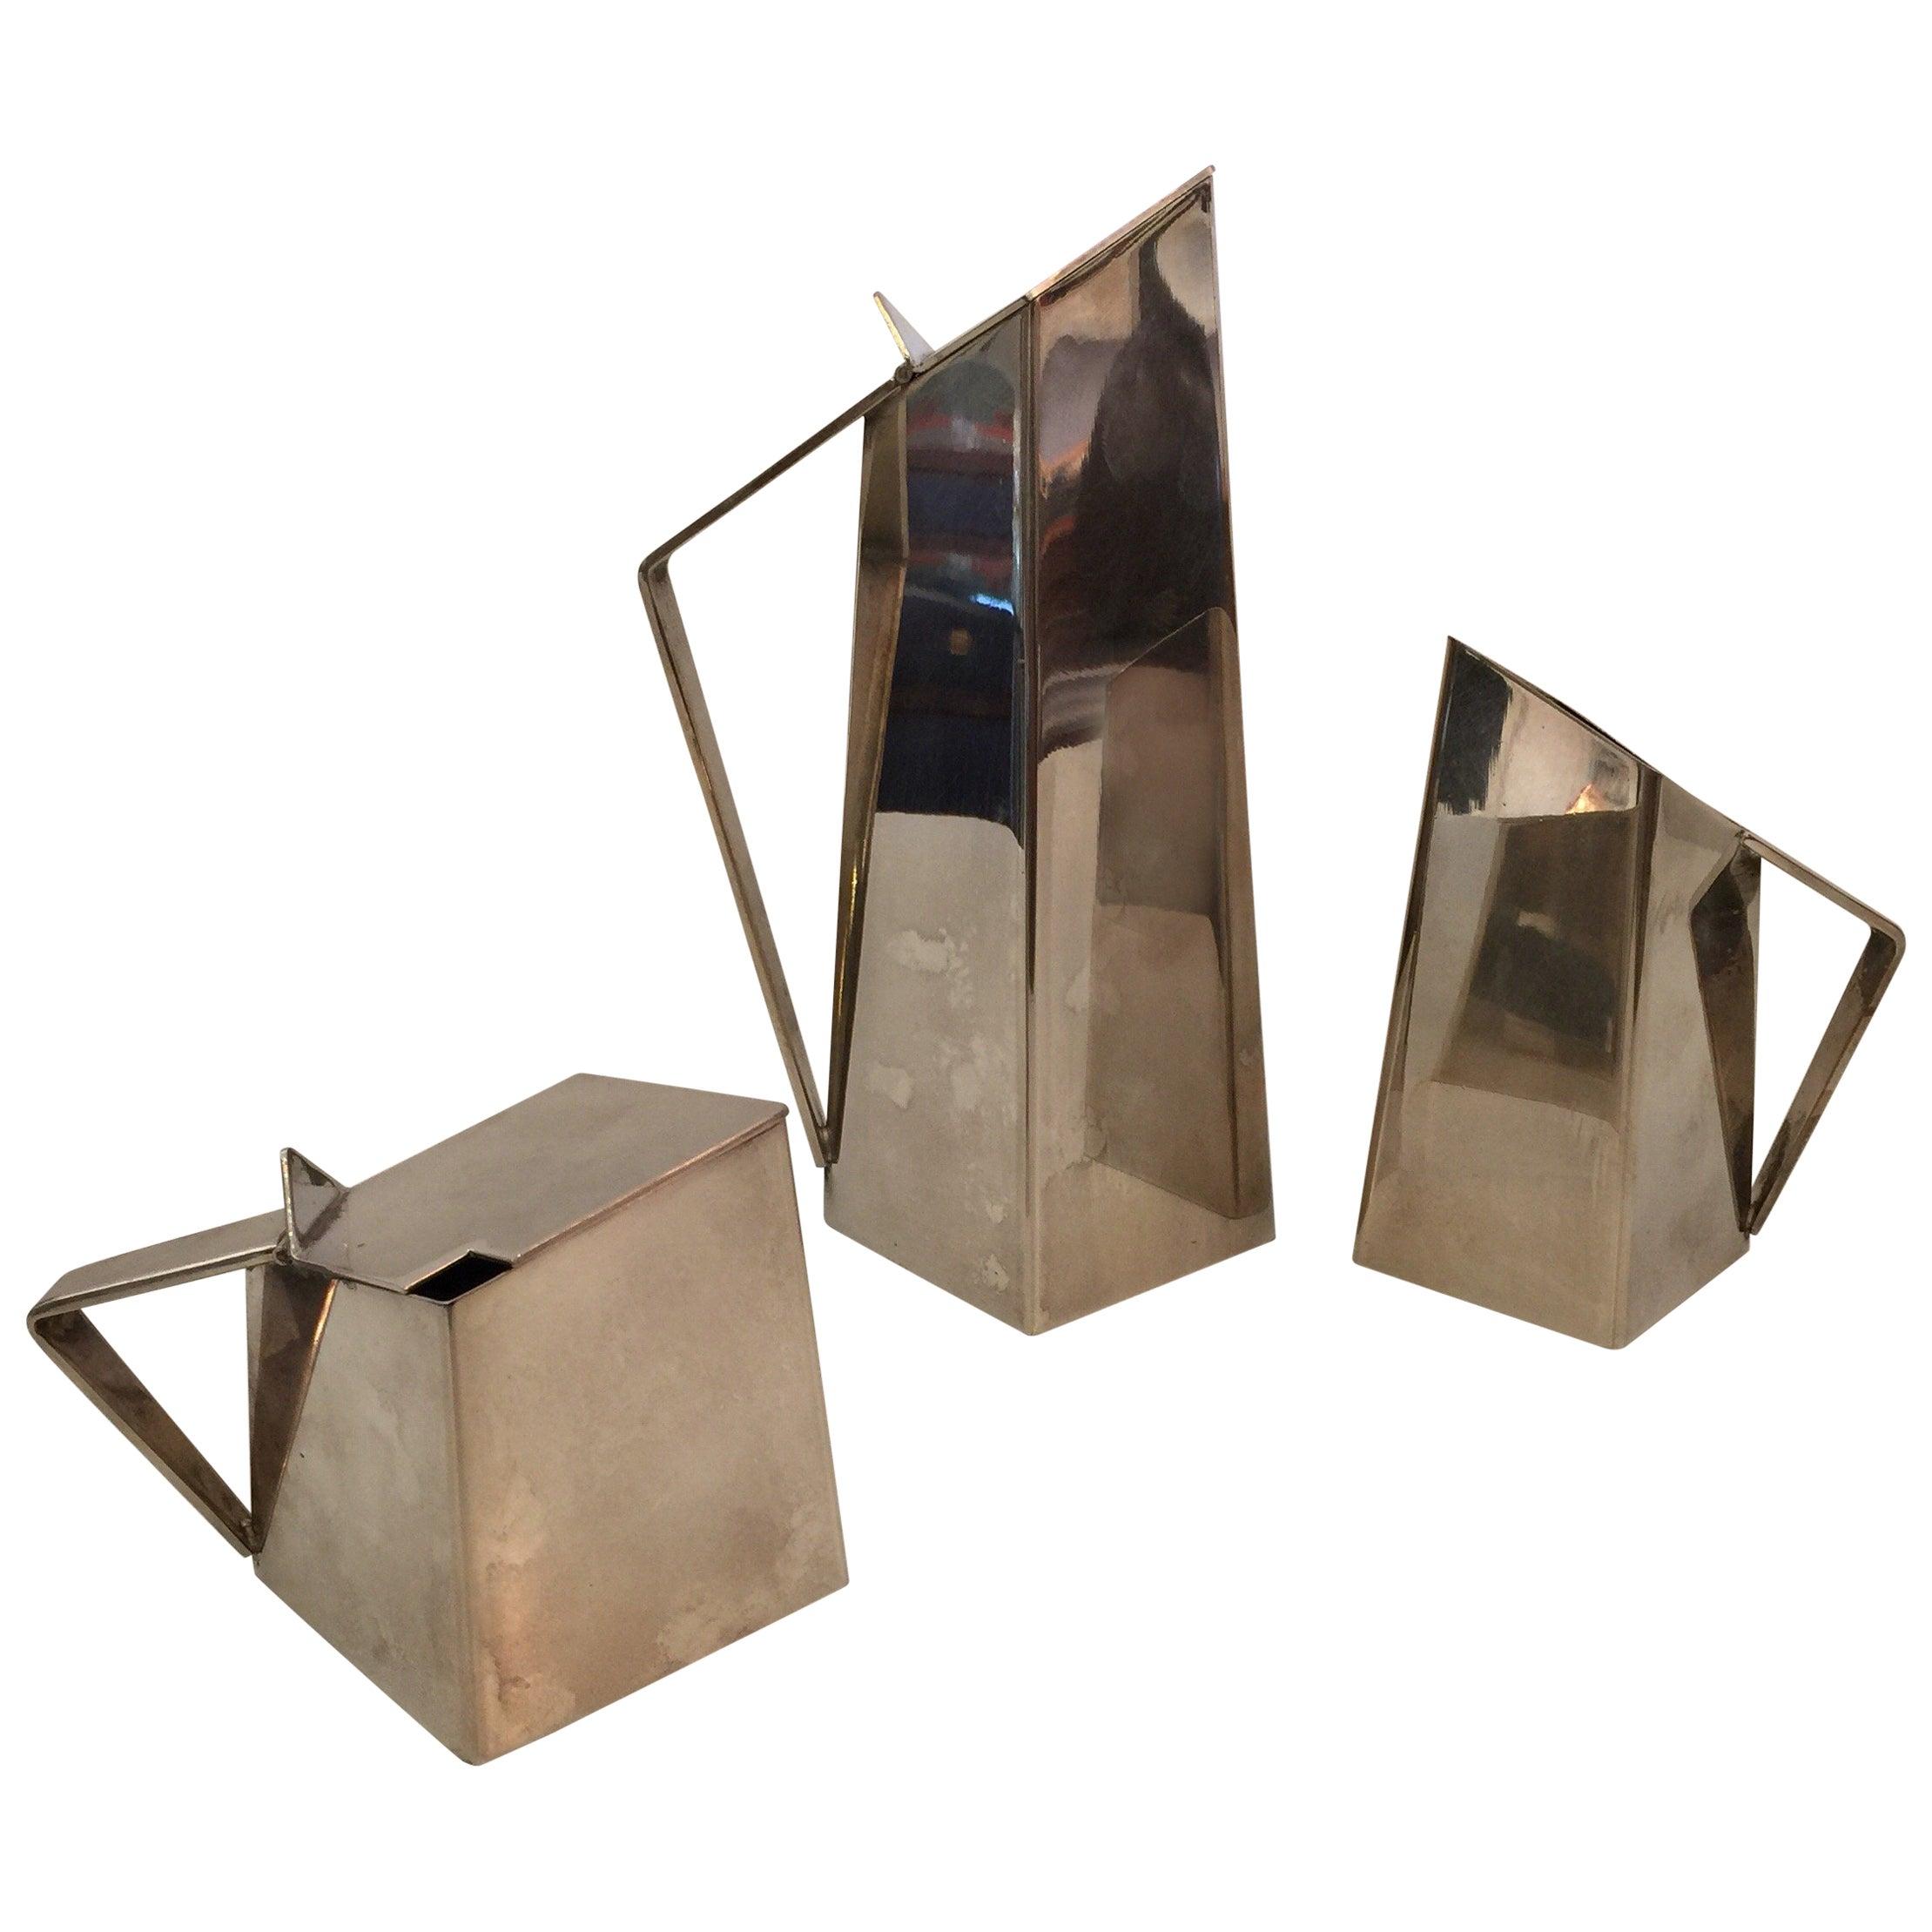 Geometric Design Silver-Plate Tea or Coffee Set, Manner of Gio Ponti